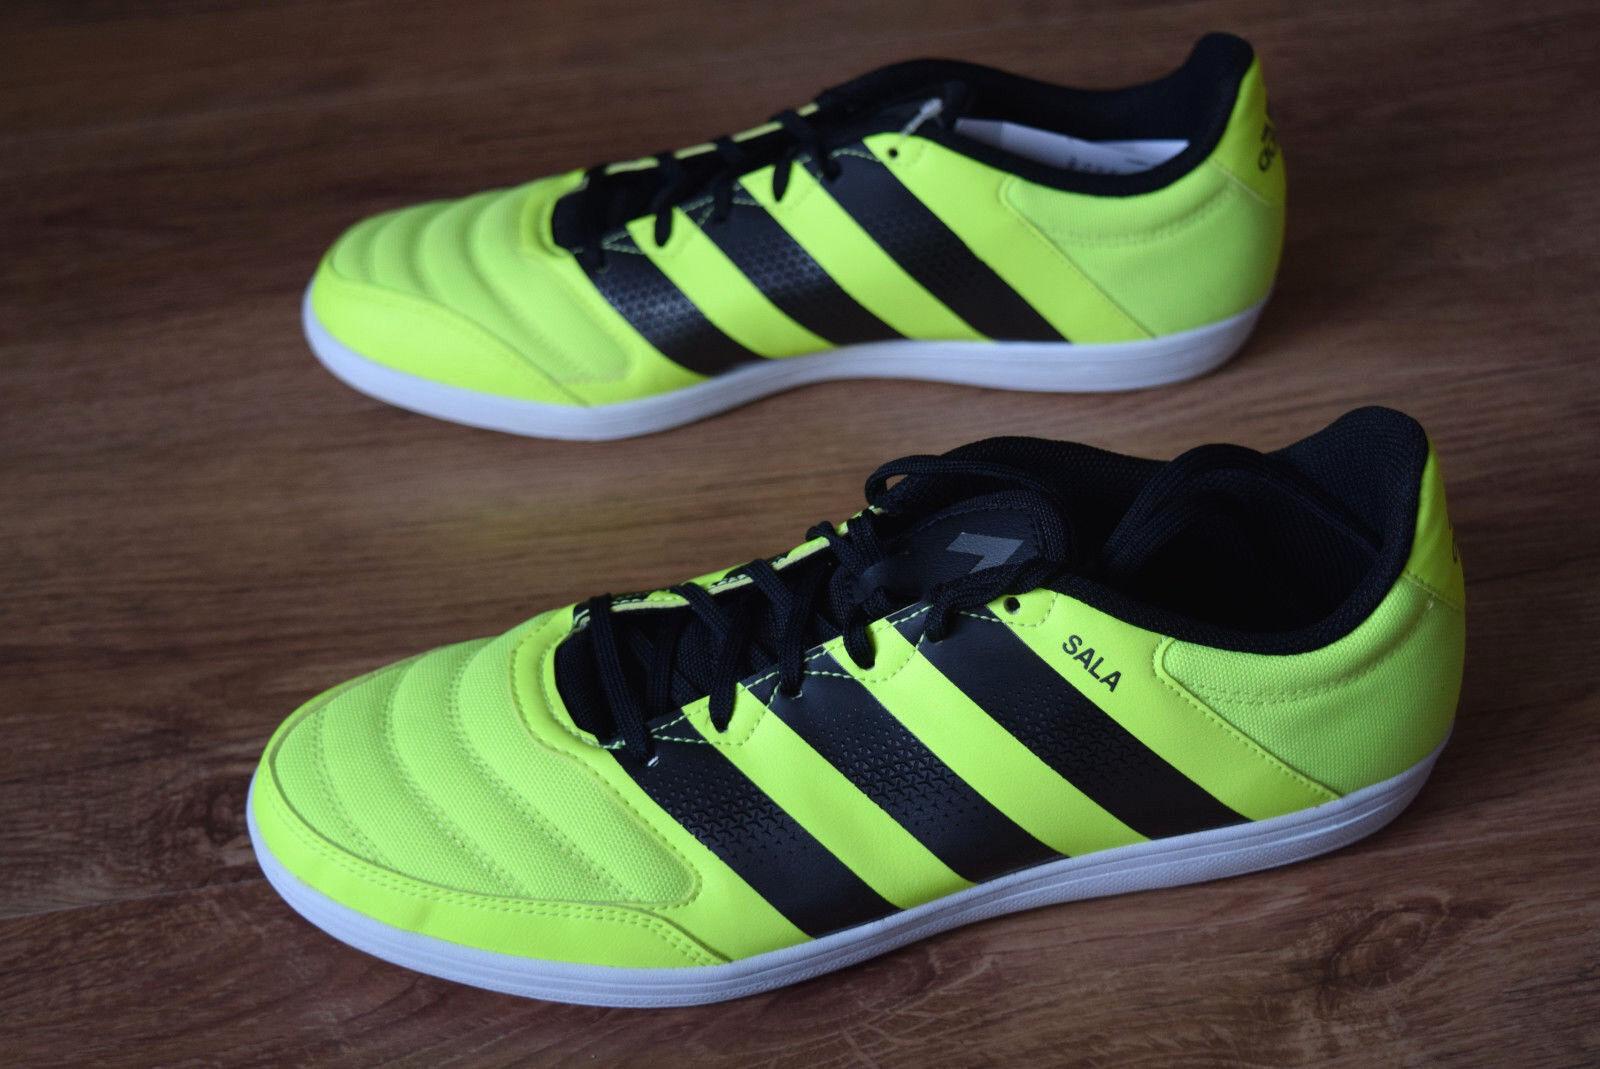 b8cc51b2a Scarpe Calcetto Indoor adidas Ace 16.4 Street CALCIO a 5 Futsal Yellow 44  2/3 for sale online | eBay